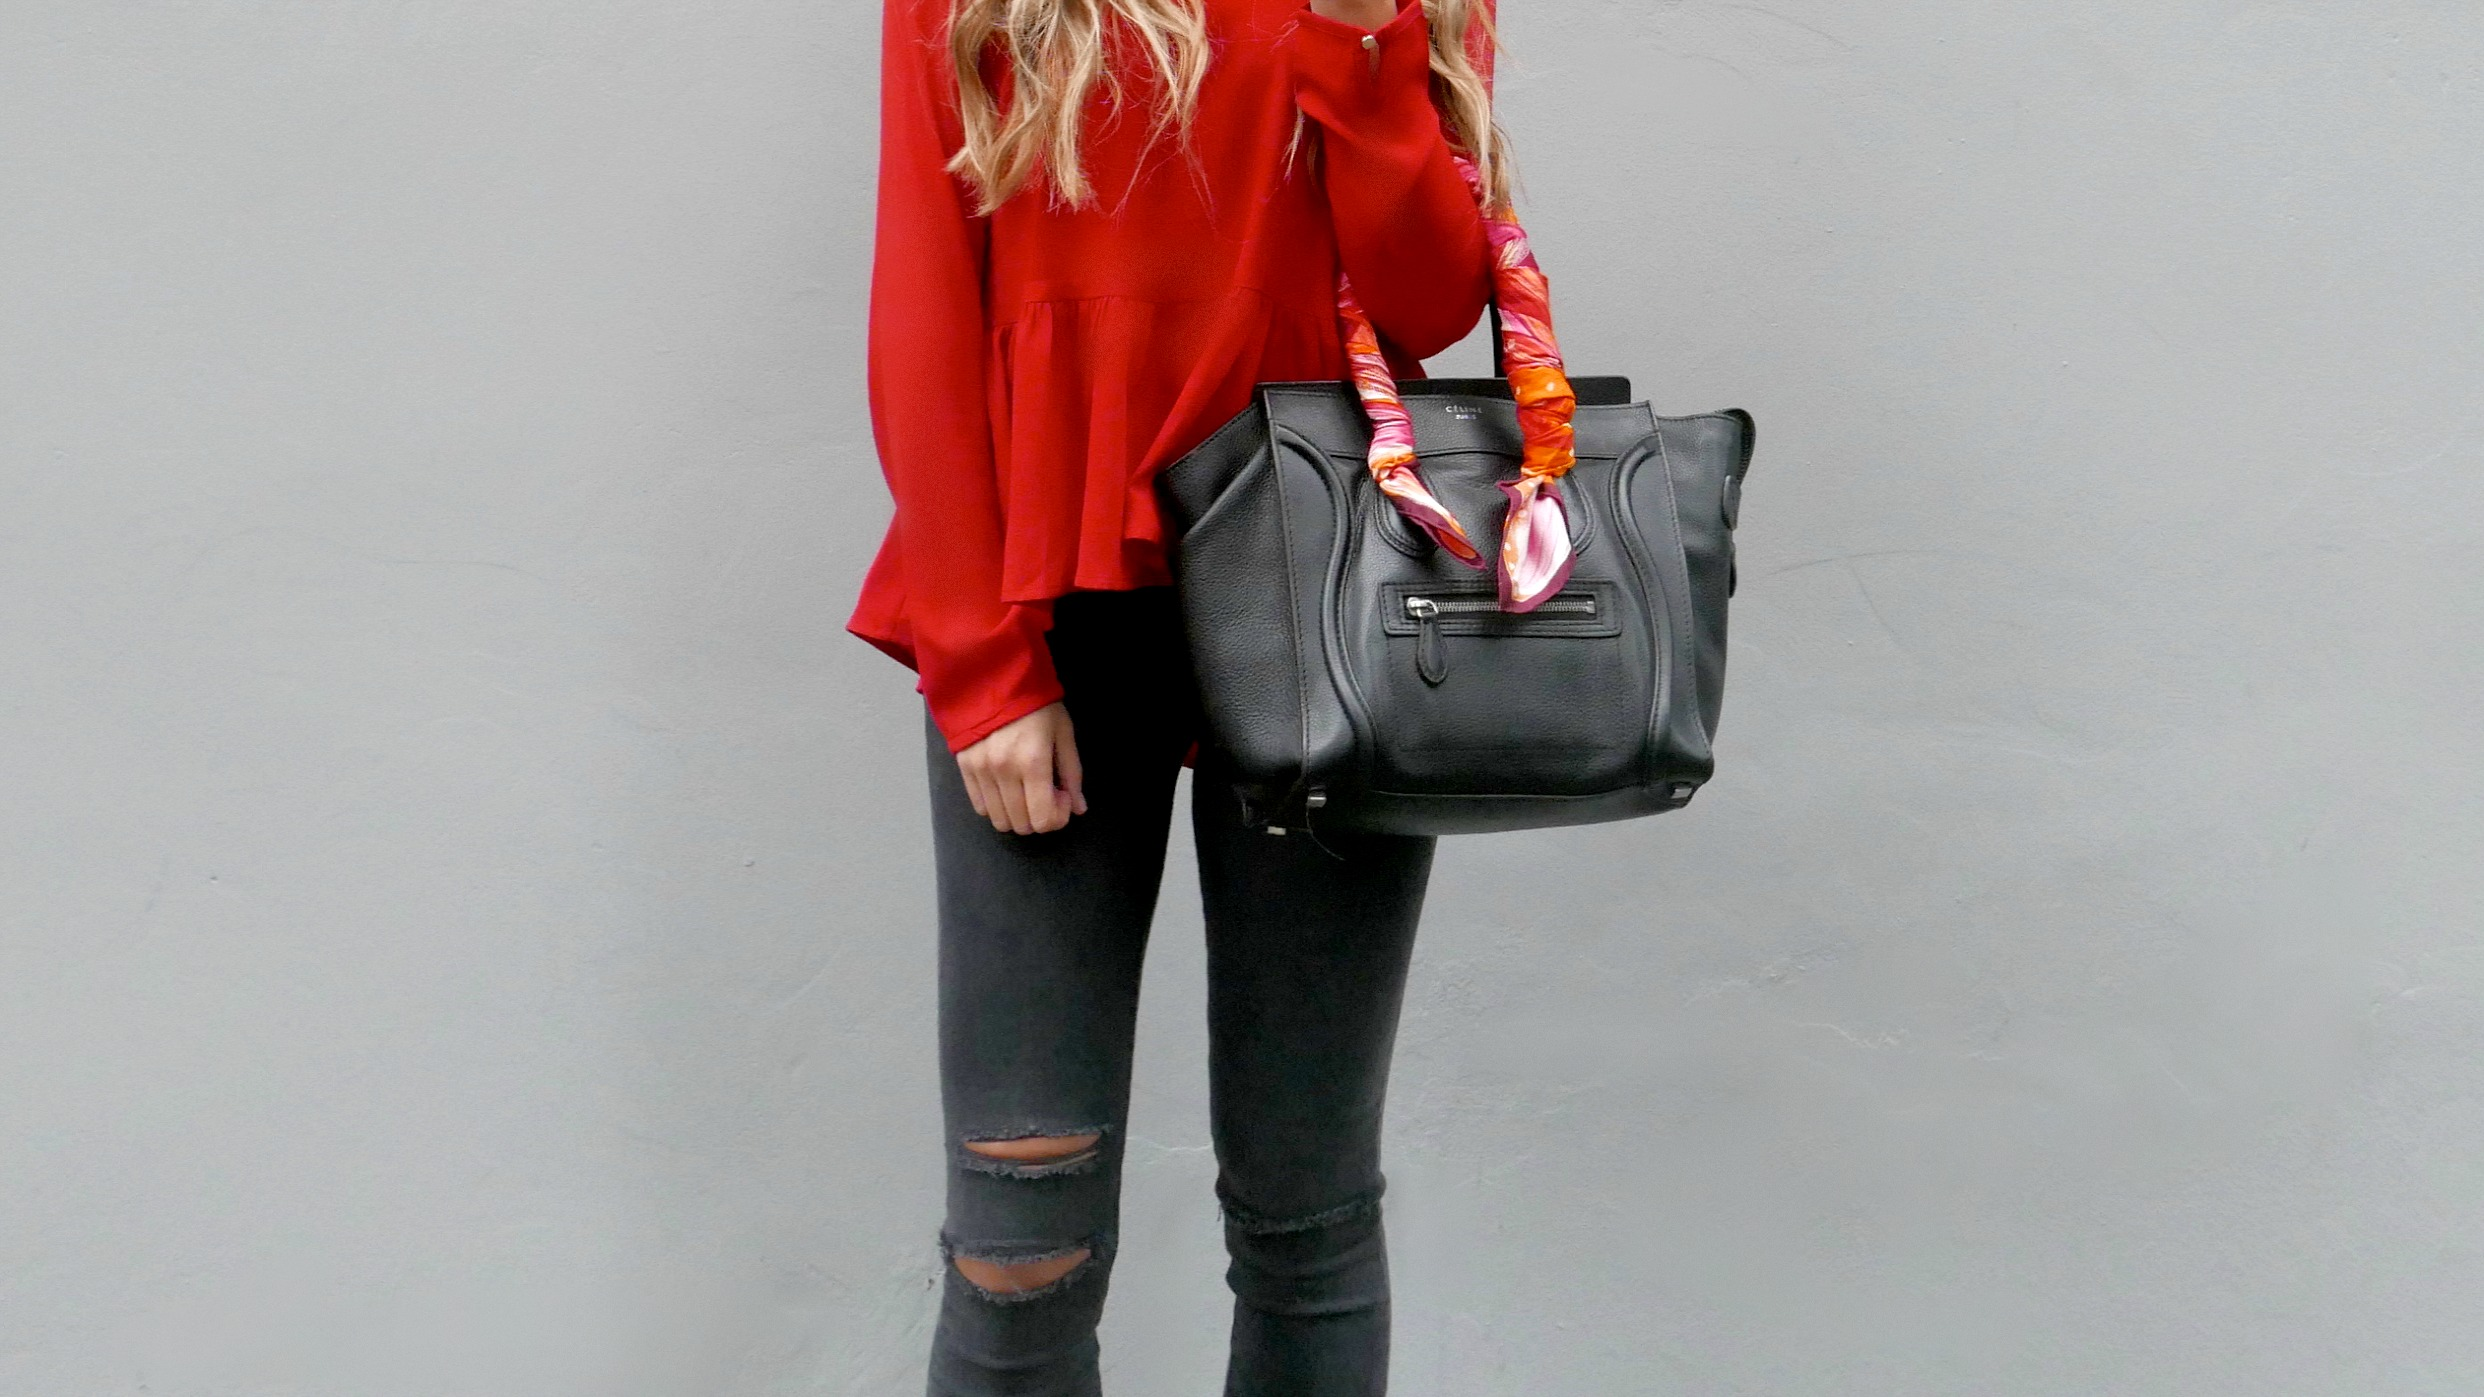 Jillian Harris for Priviledge Top ,  Tommy Hilfiger  Jacket,  J.Brand  Jeans,  Céline  Bag, Hermes Scarf via  Rice and Beans Vintage ,  Nine West  Heels